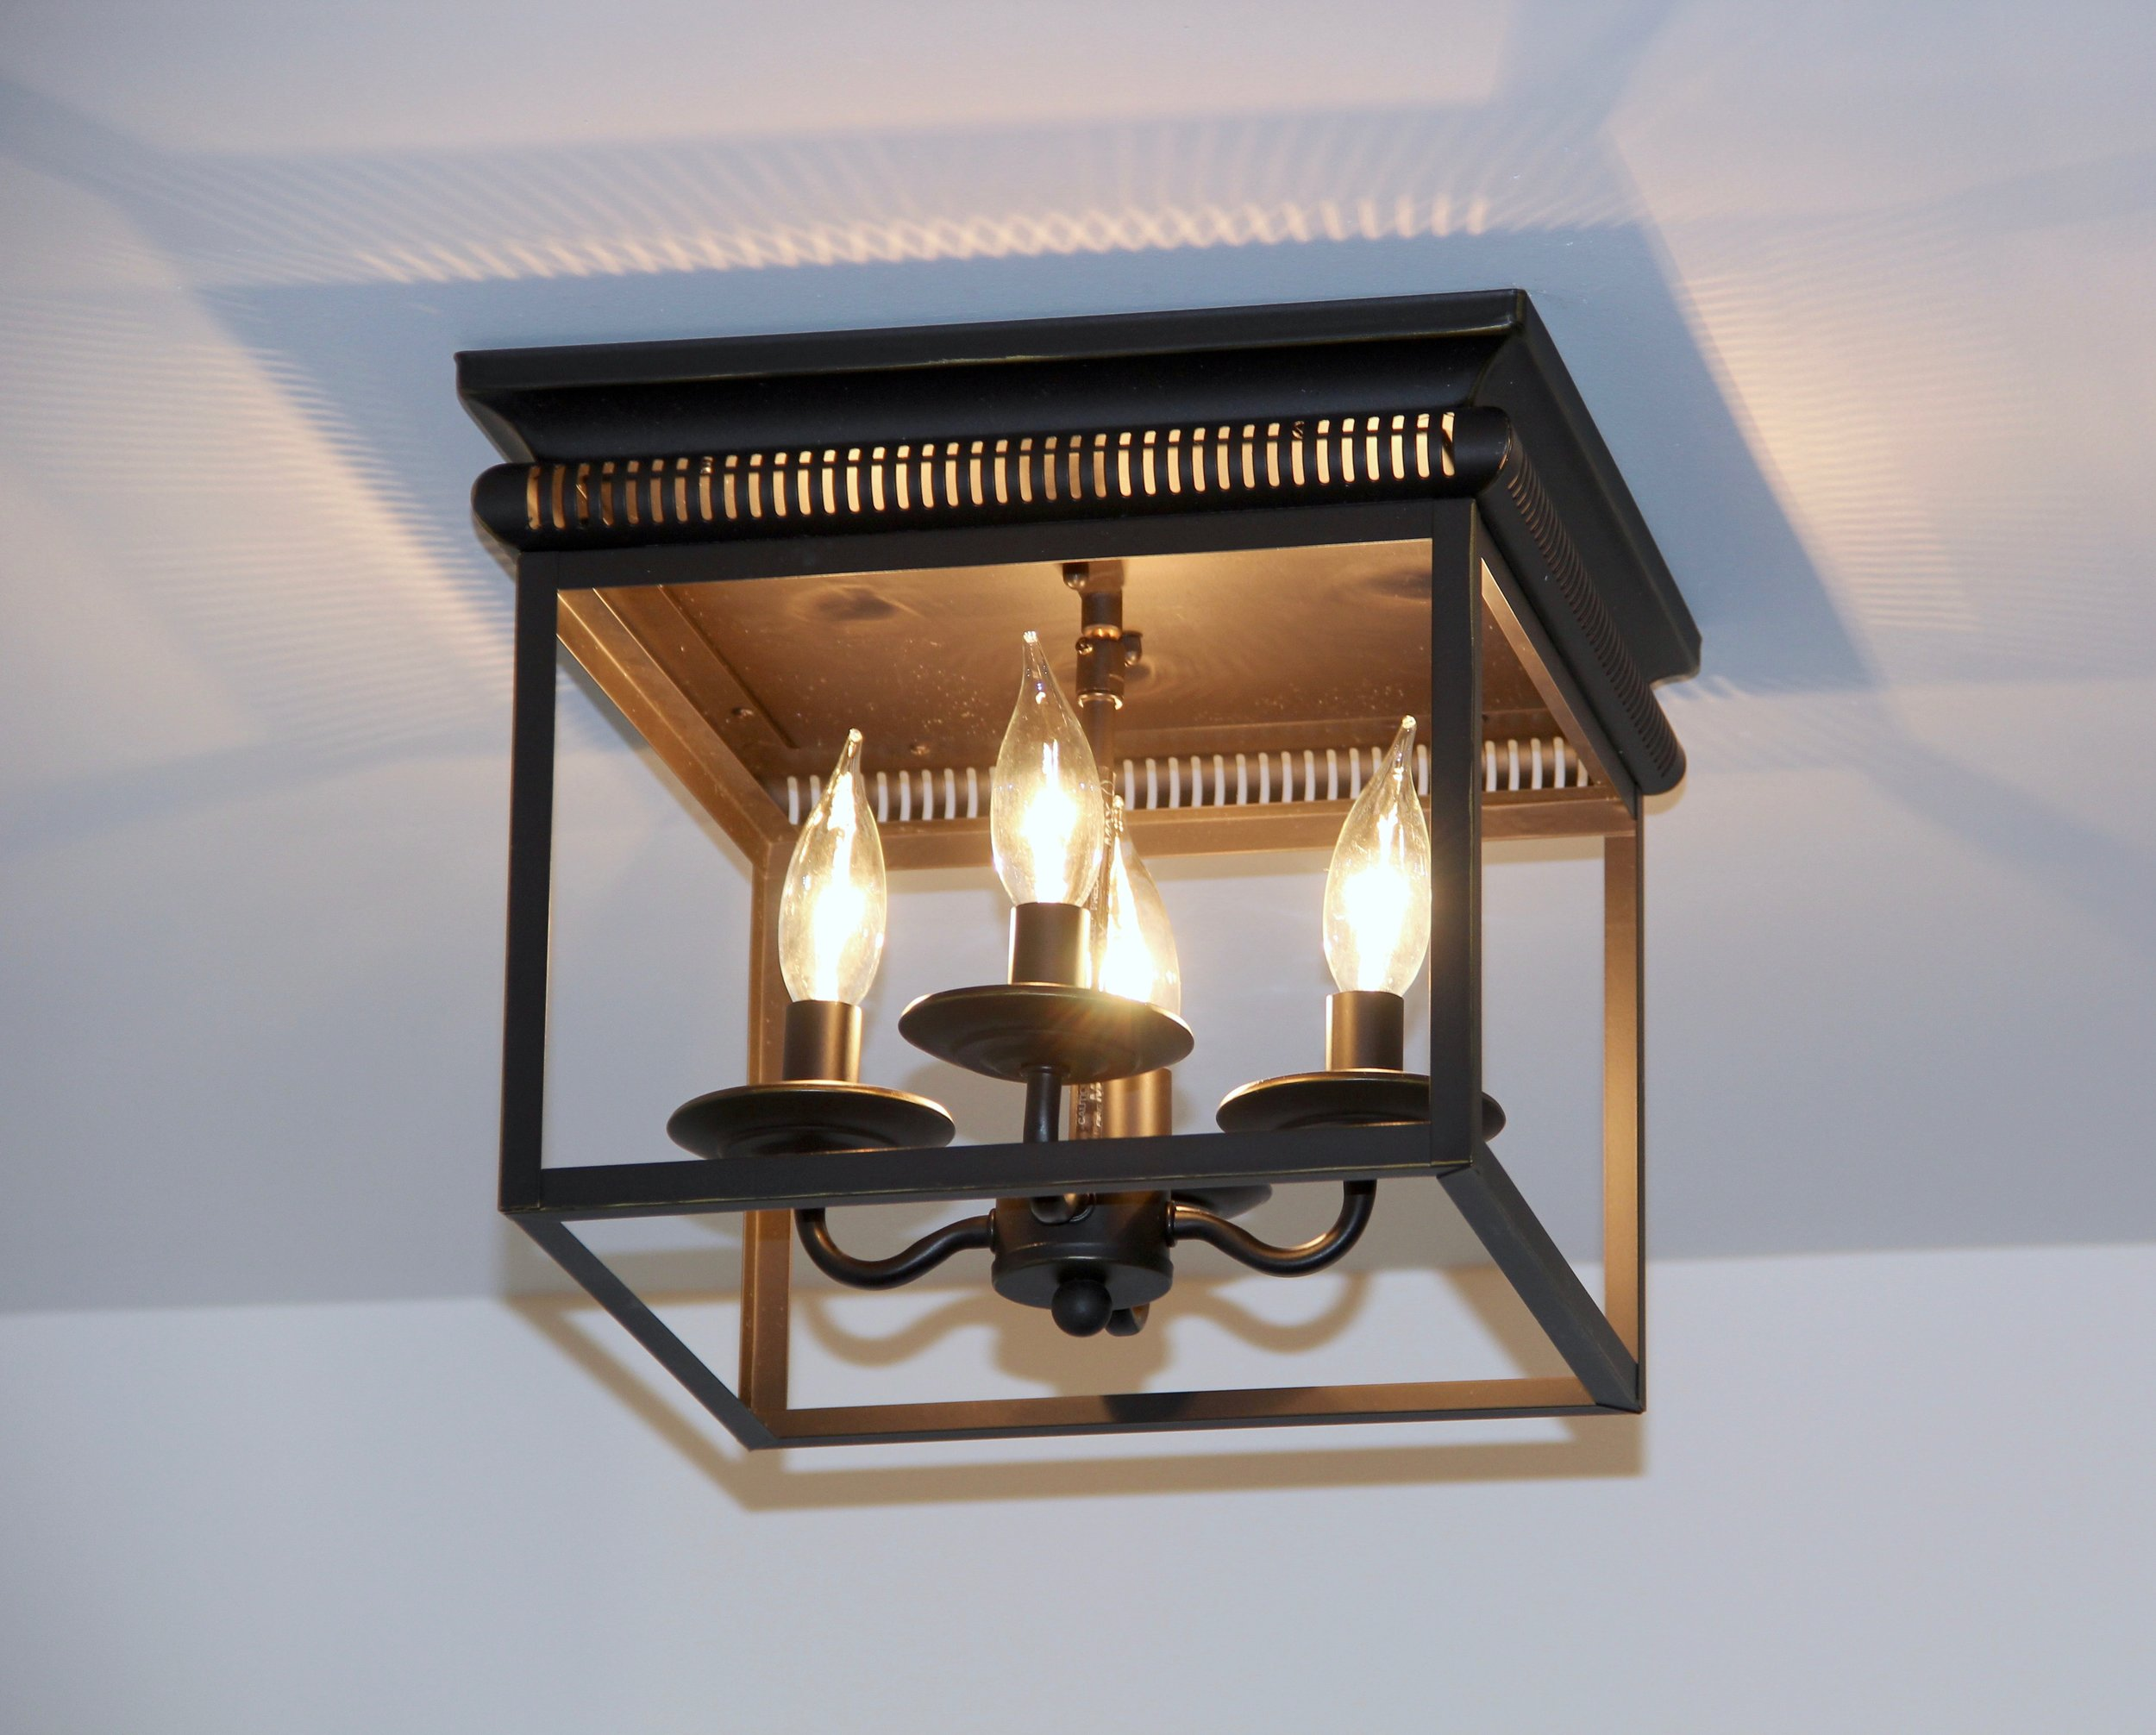 How to hang a lighting fixture